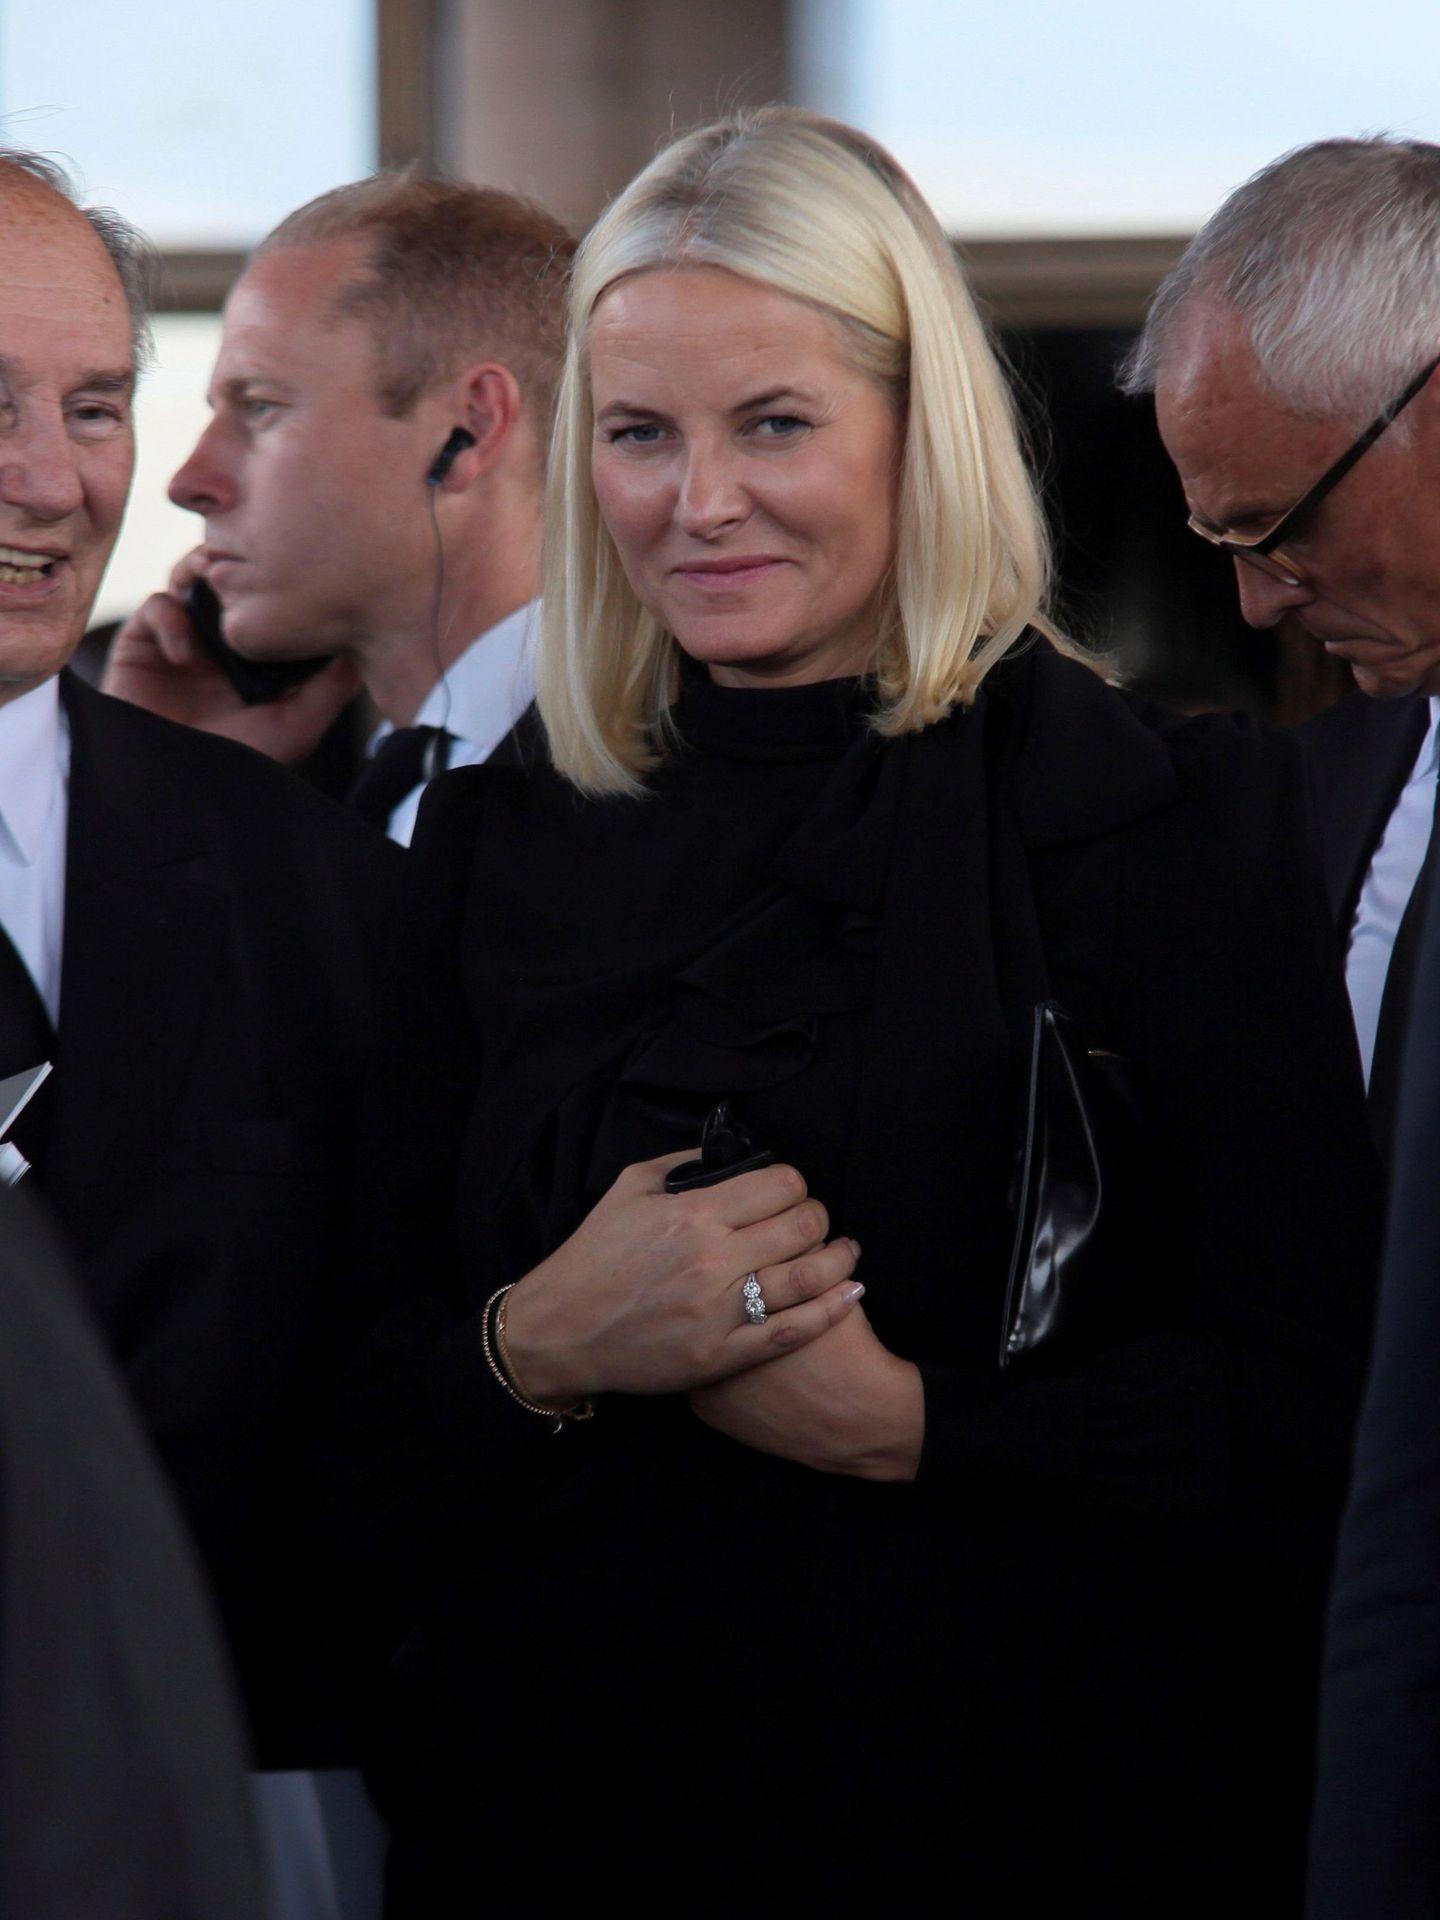 La princesa Mette Marit de Noruega. (Reuters)